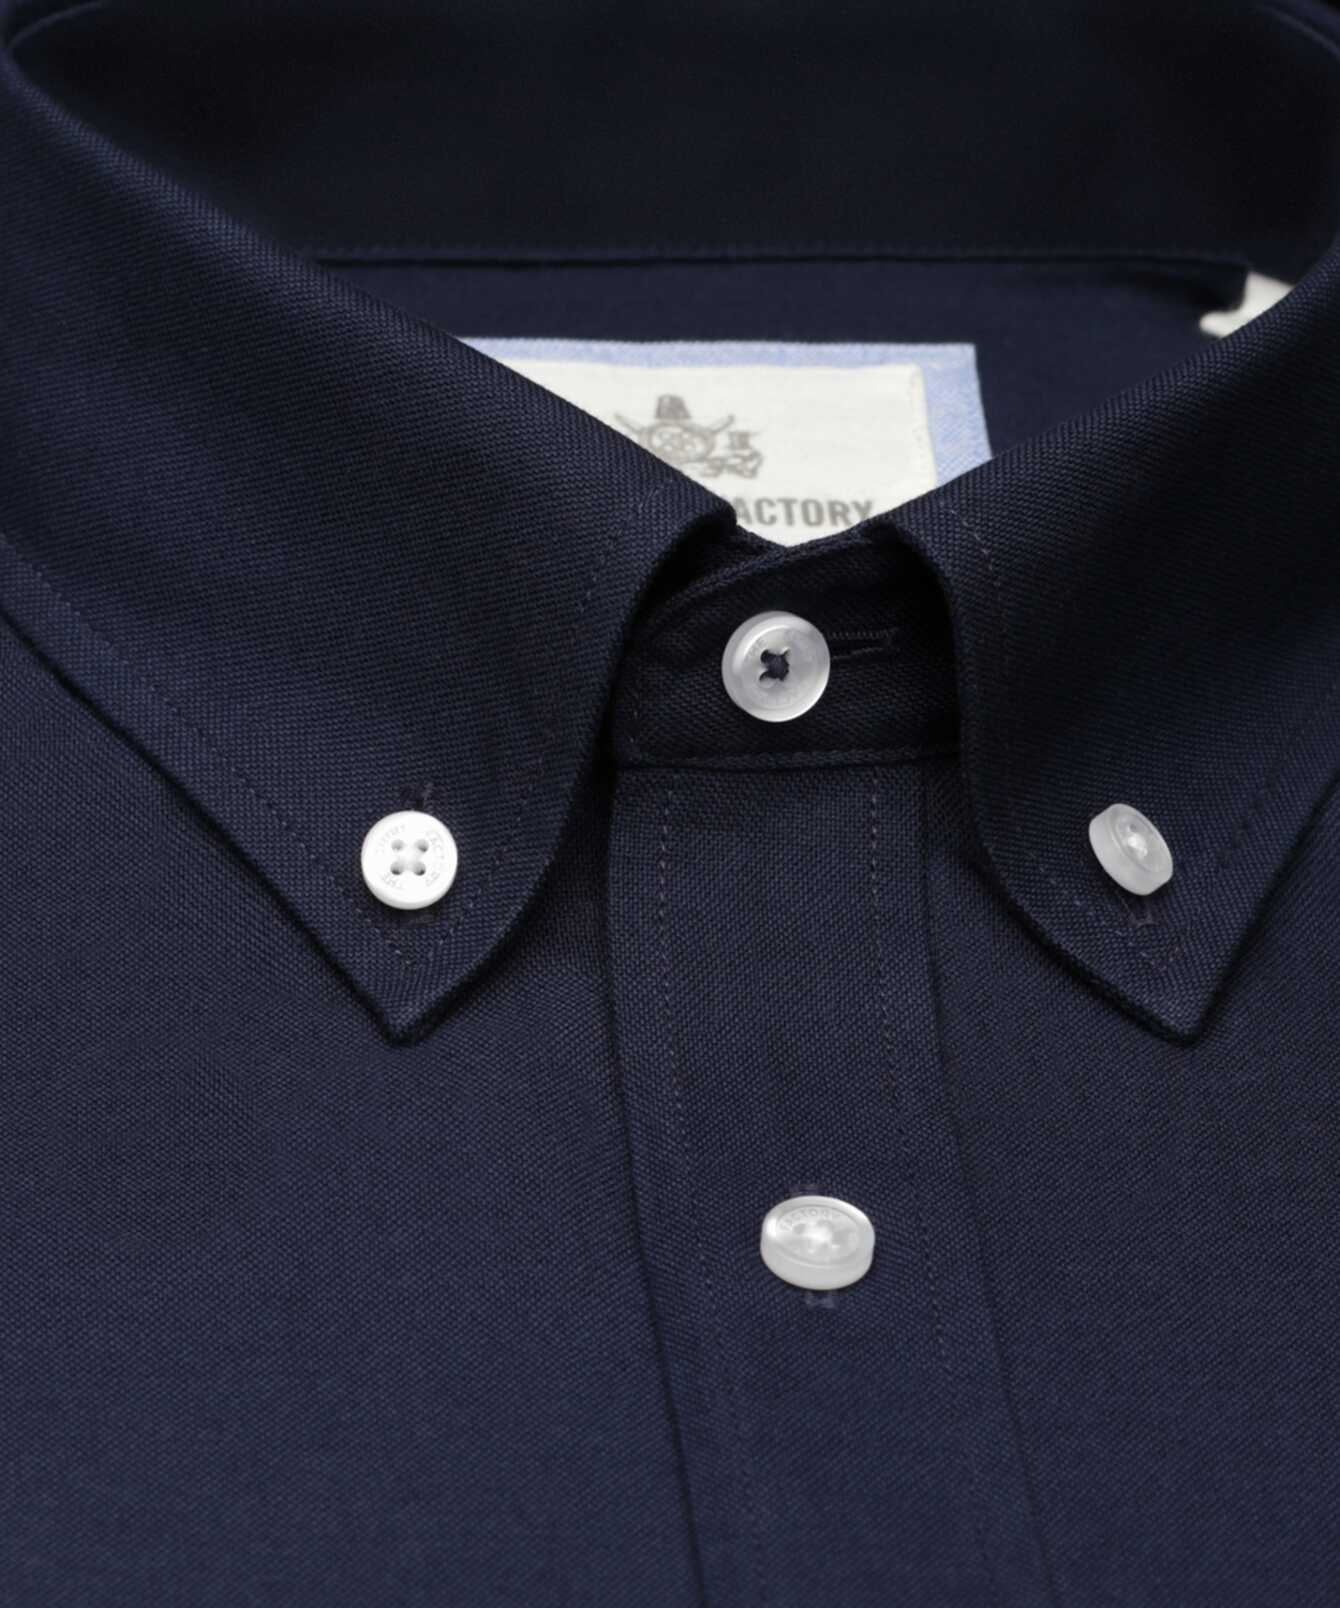 Shirt Hampton Oxford Navy The Shirt Factory